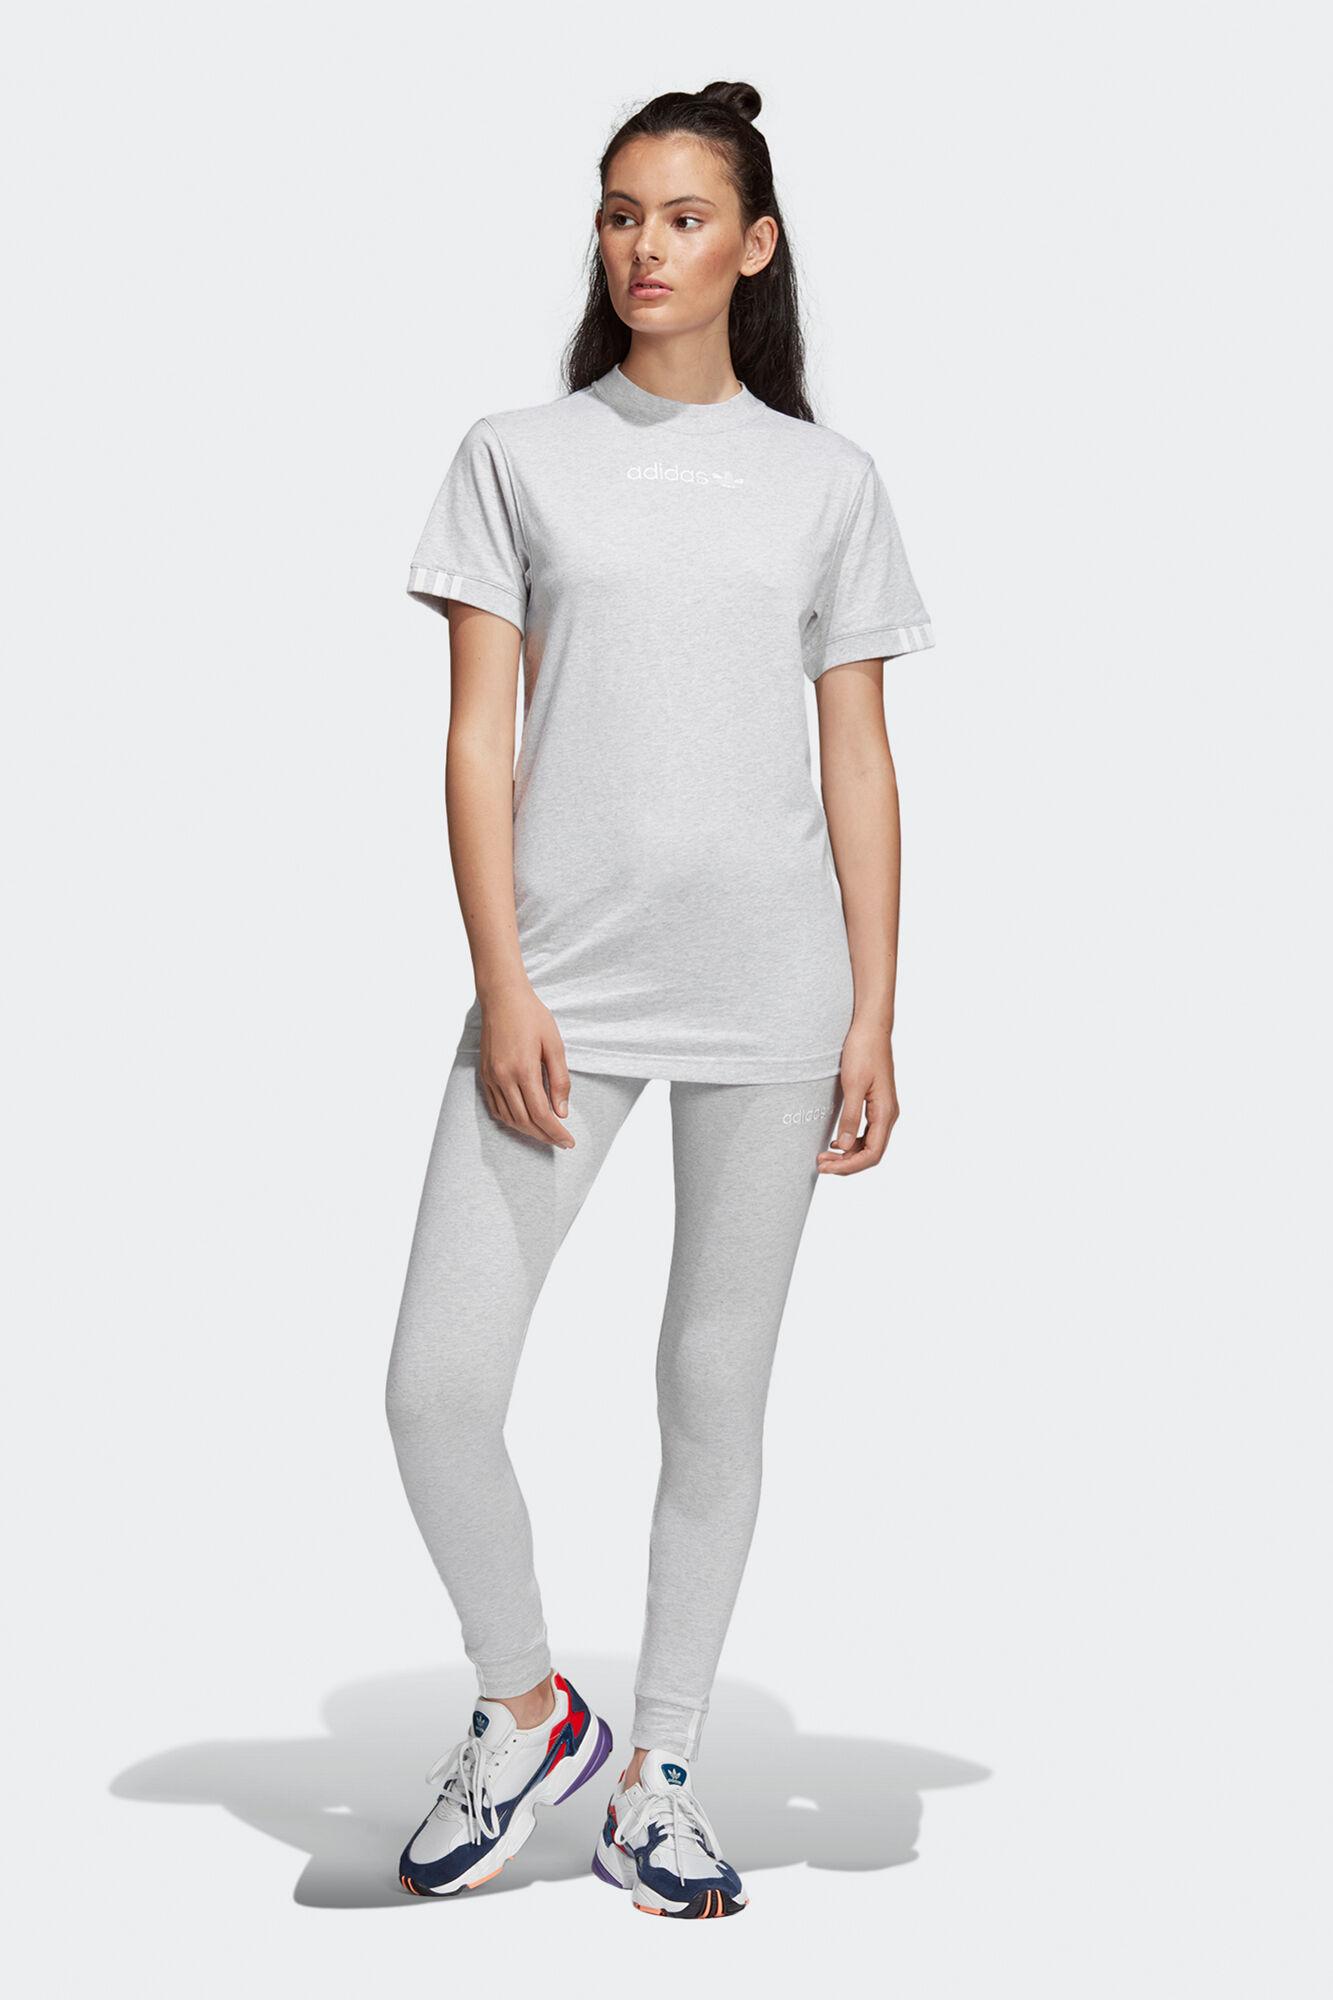 Coeeze T-shirt DU7191, LIGHT GREY HEATHER